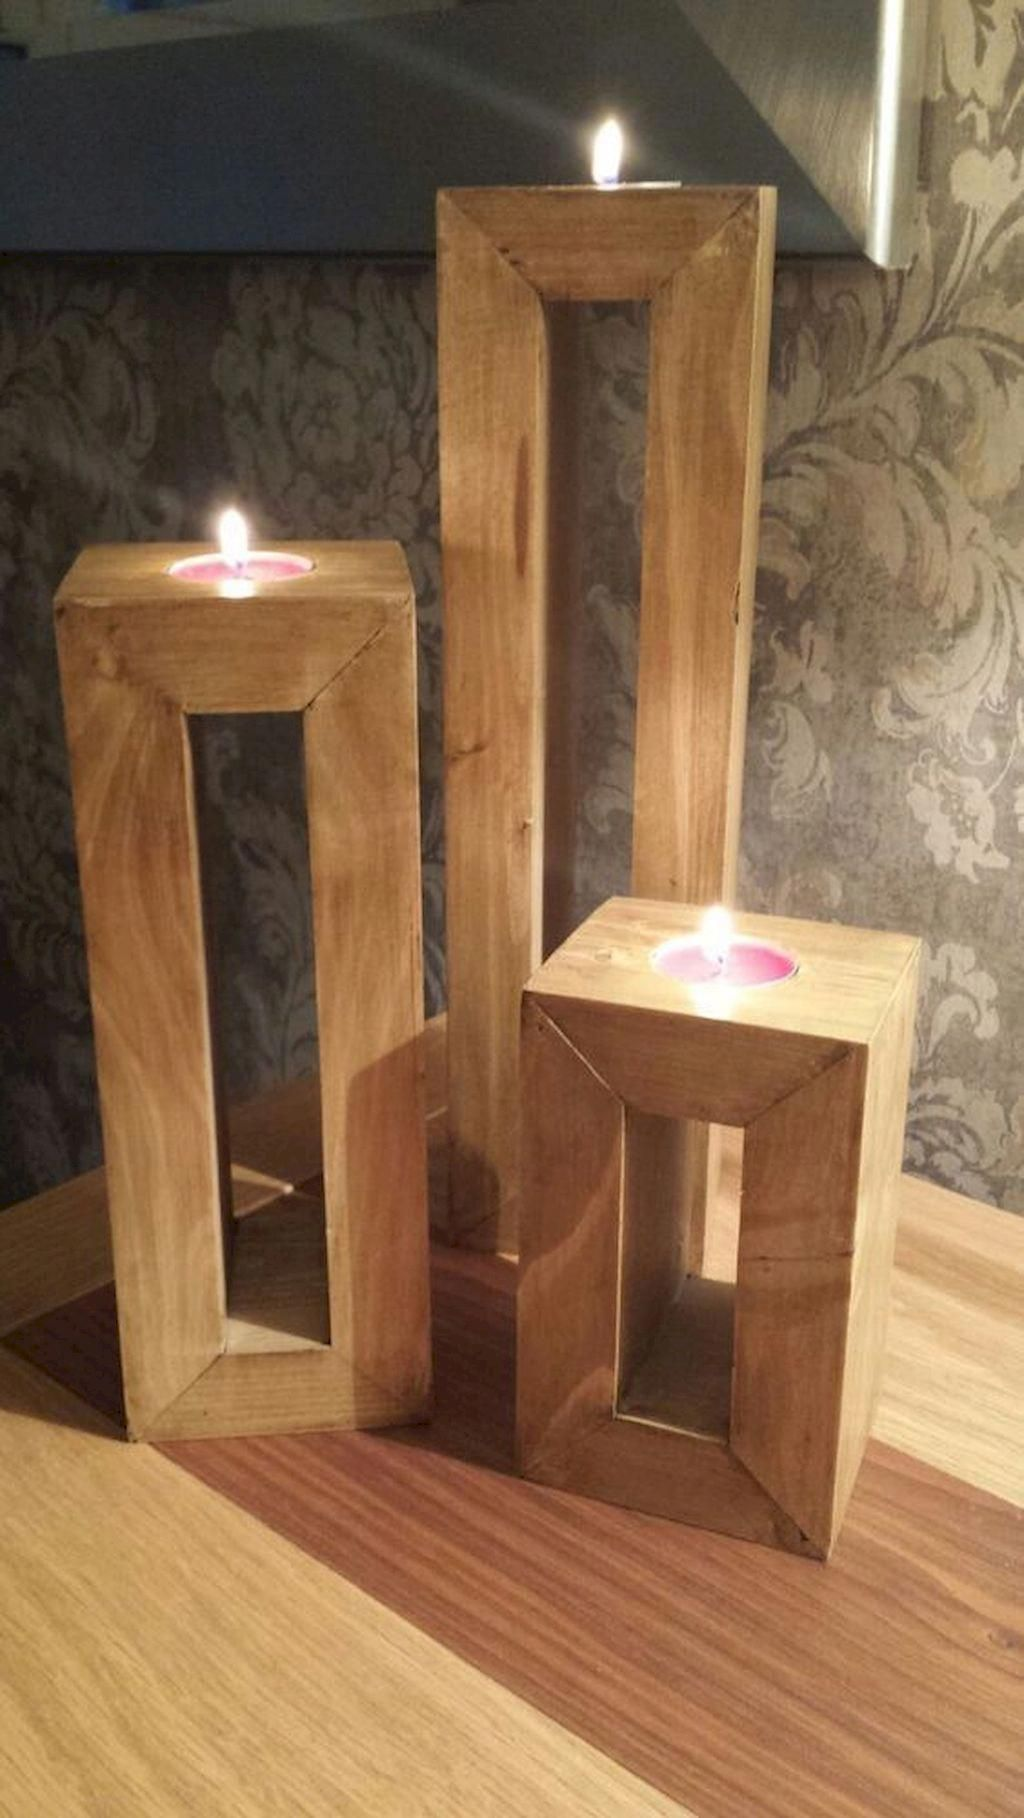 40 Easy Diy Wood Projects Ideas For Beginner Diy Wood